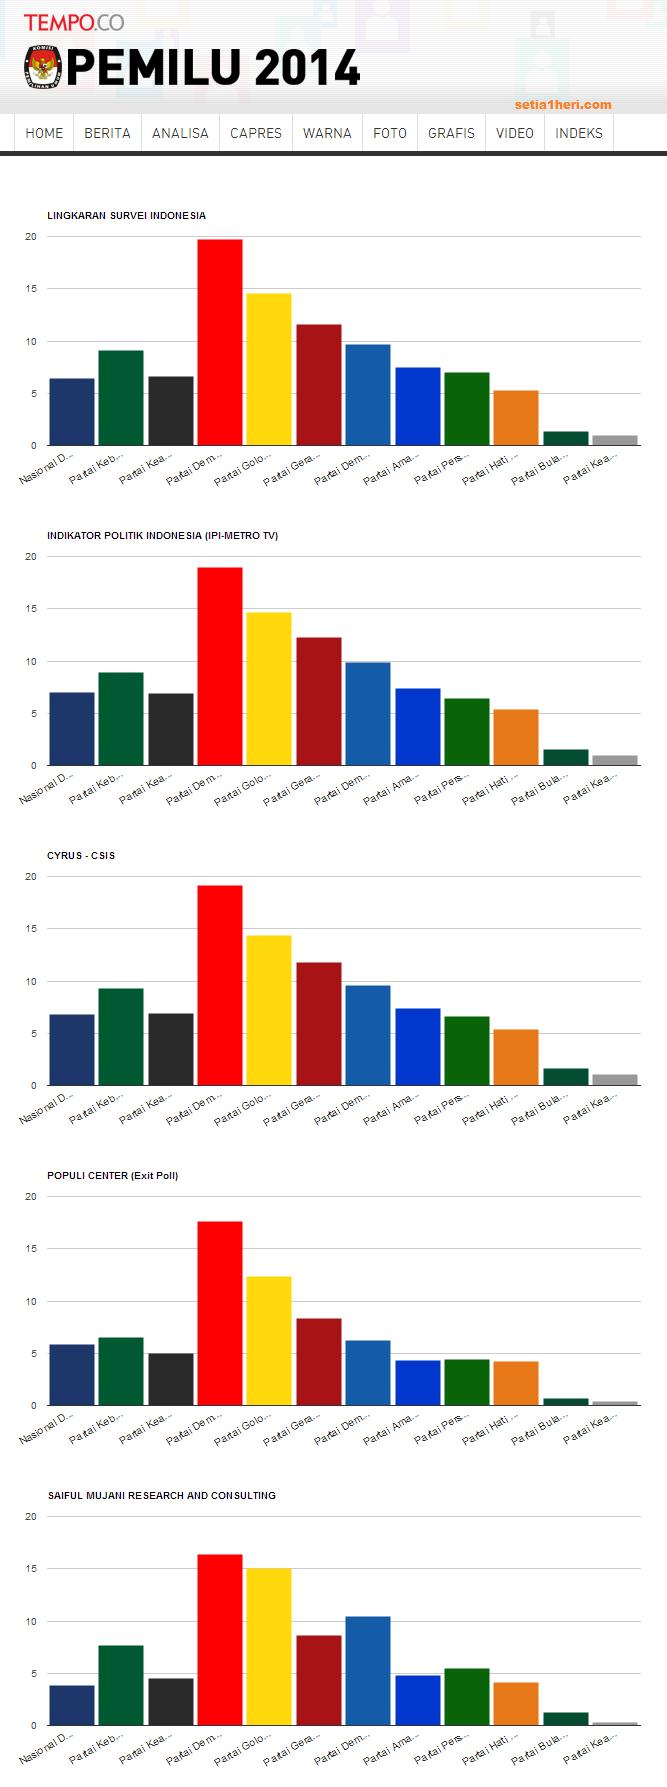 hitung_cepat   Pemilu 2014   tempo.co